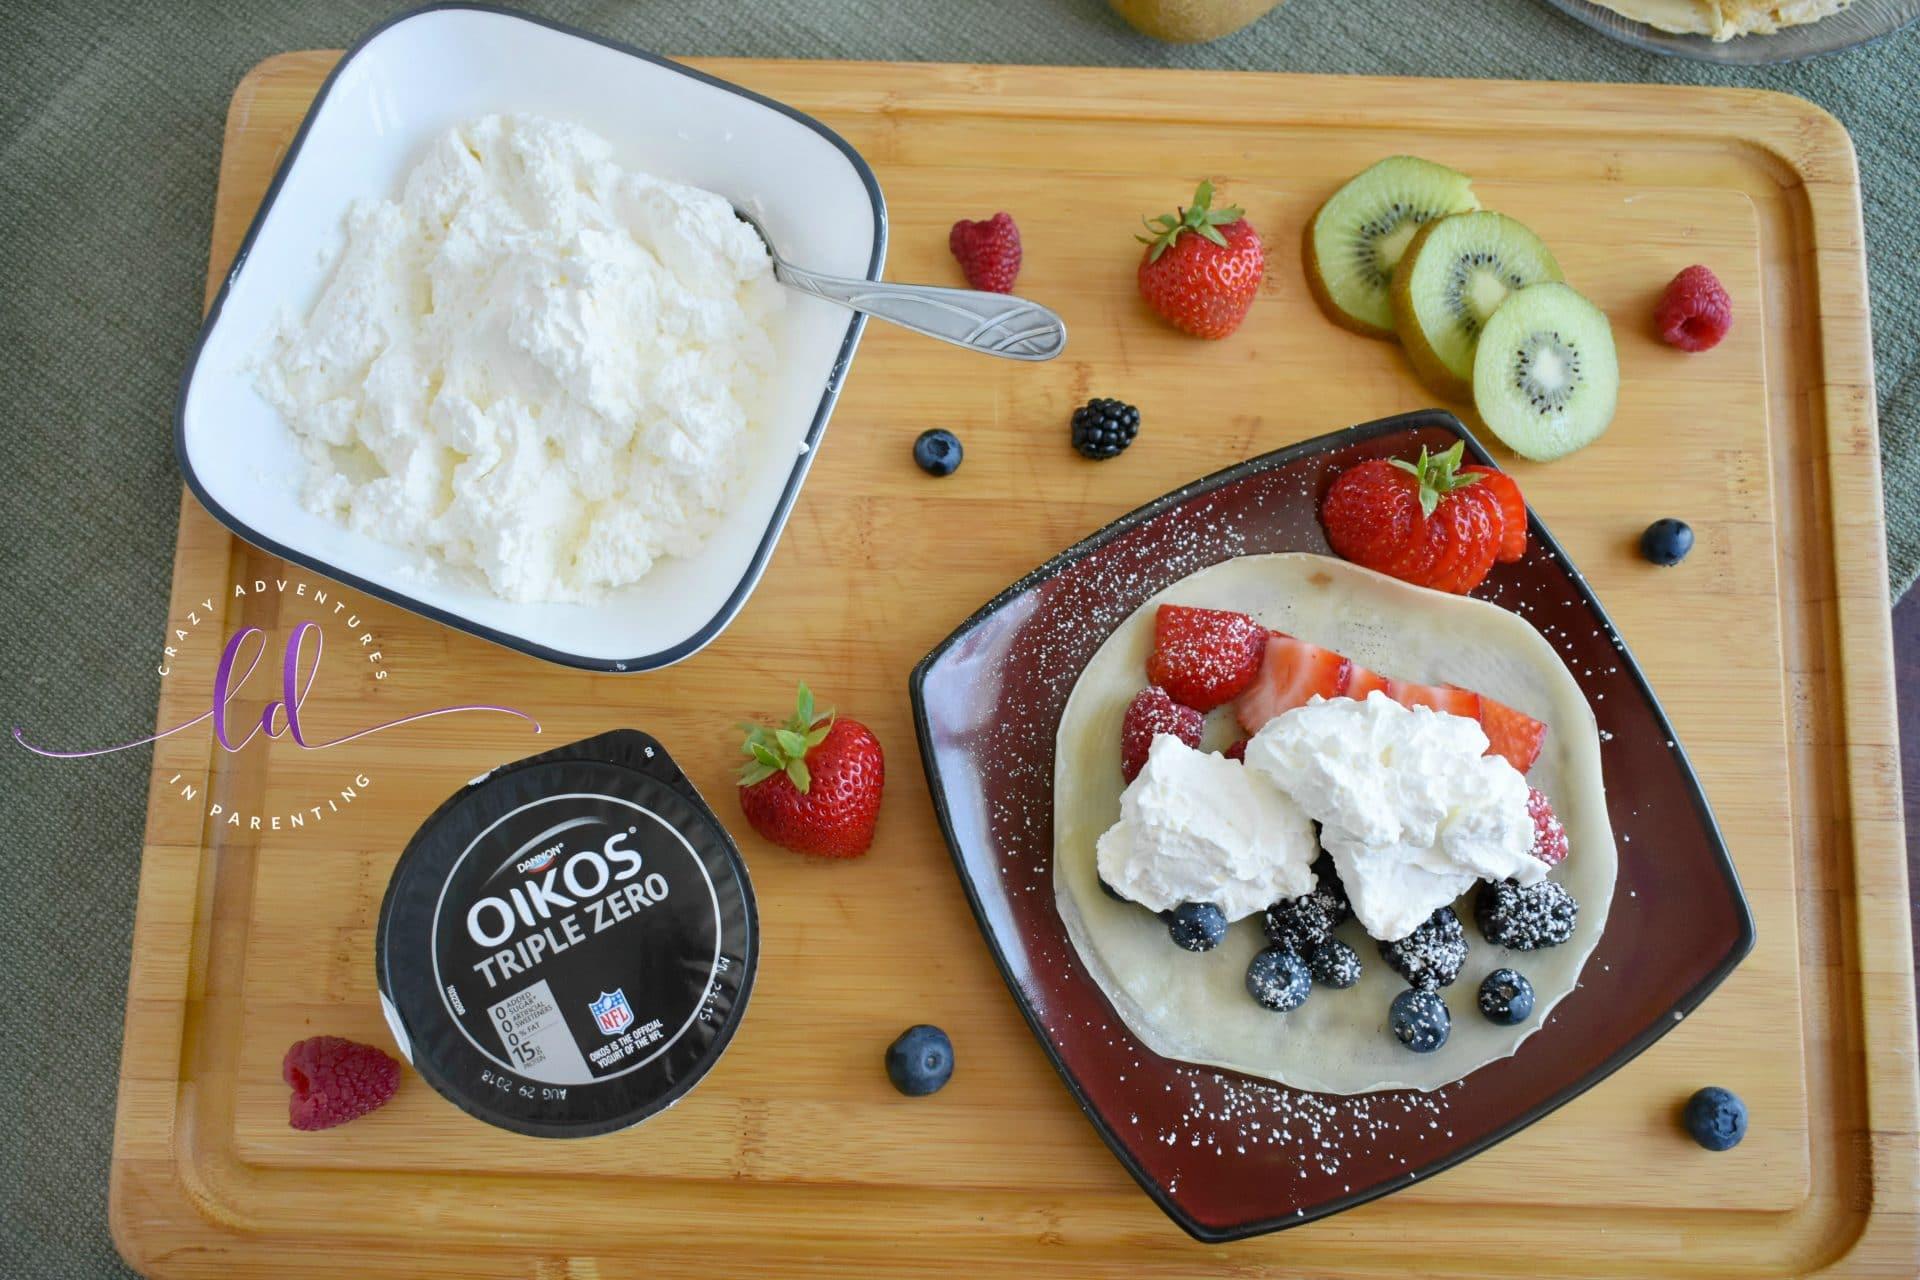 Yogurt Whipped Cream made with Oikos Triple Zero on Fruit Crepes